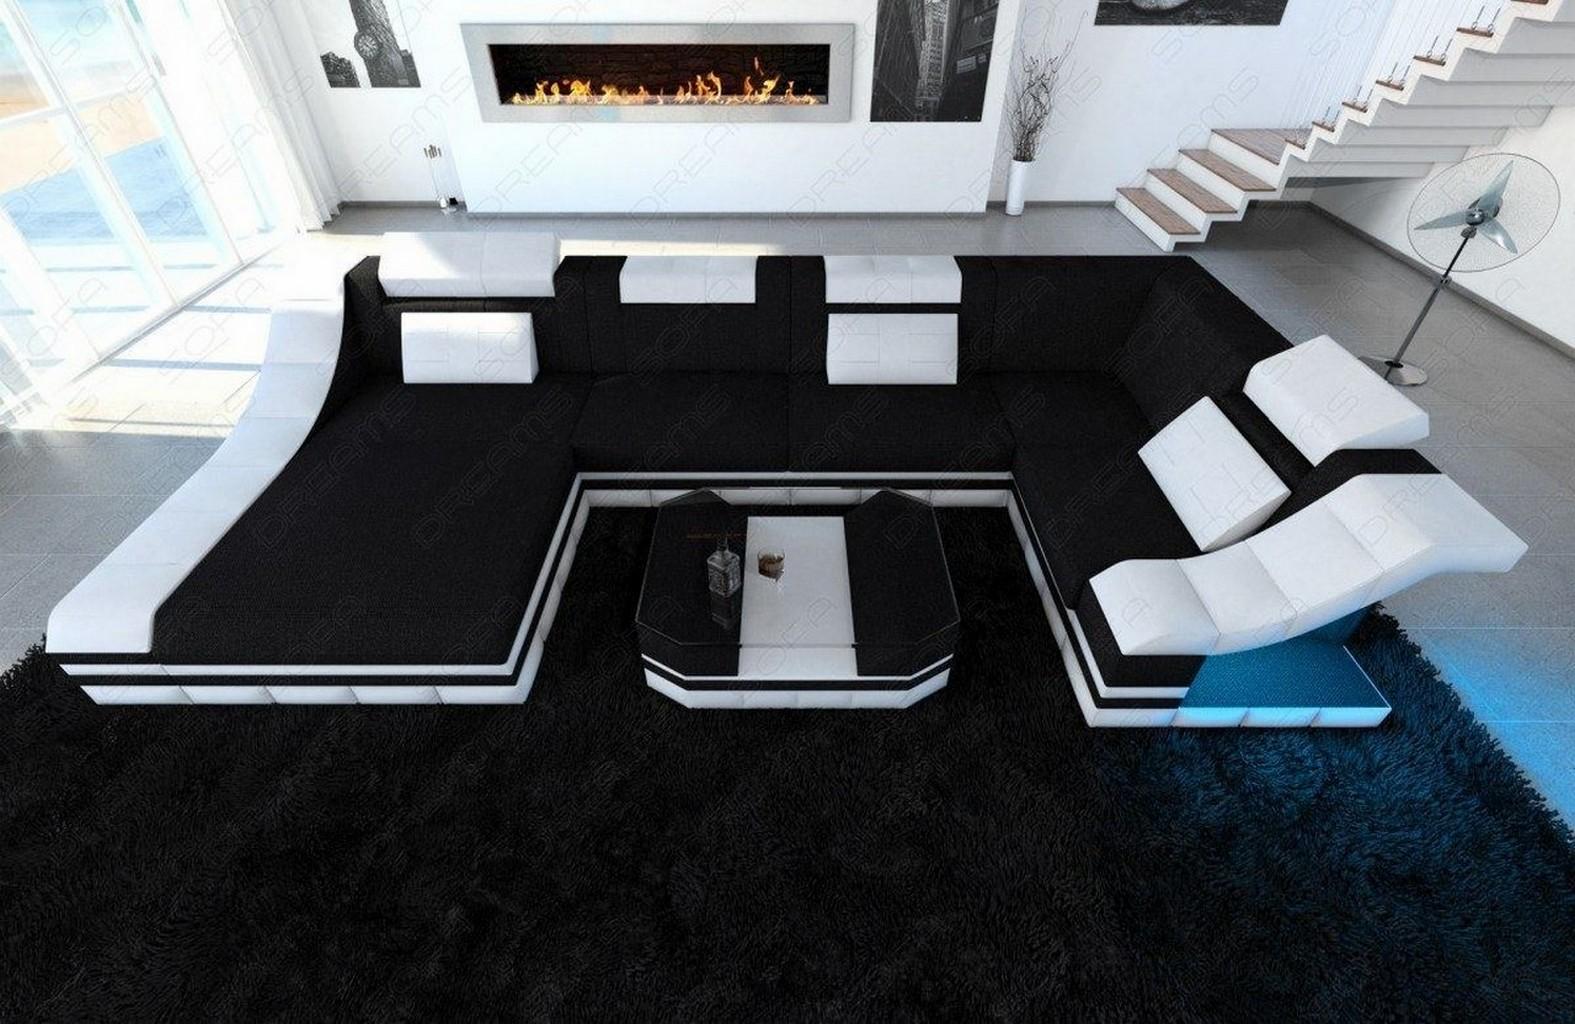 wohnlandschaft couch garnitur turino u form stoffsofa eckcouch led beleuchtung ebay. Black Bedroom Furniture Sets. Home Design Ideas